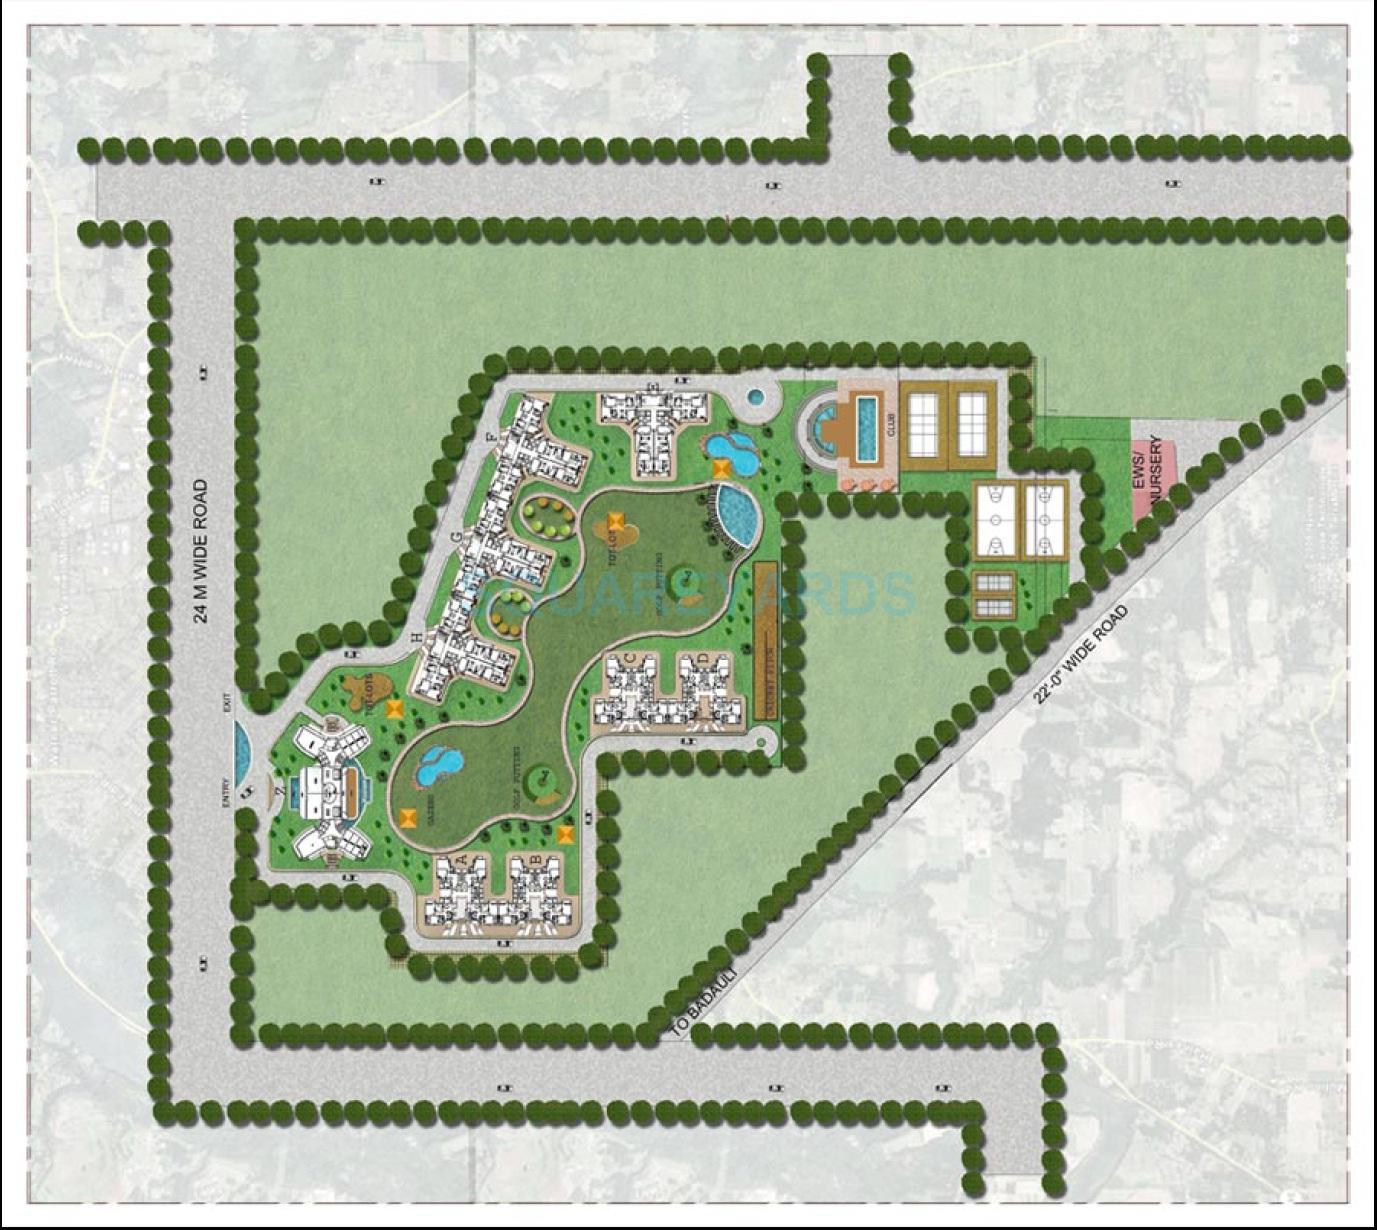 master-plan-image-Picture-bptp-park-arena-2351615